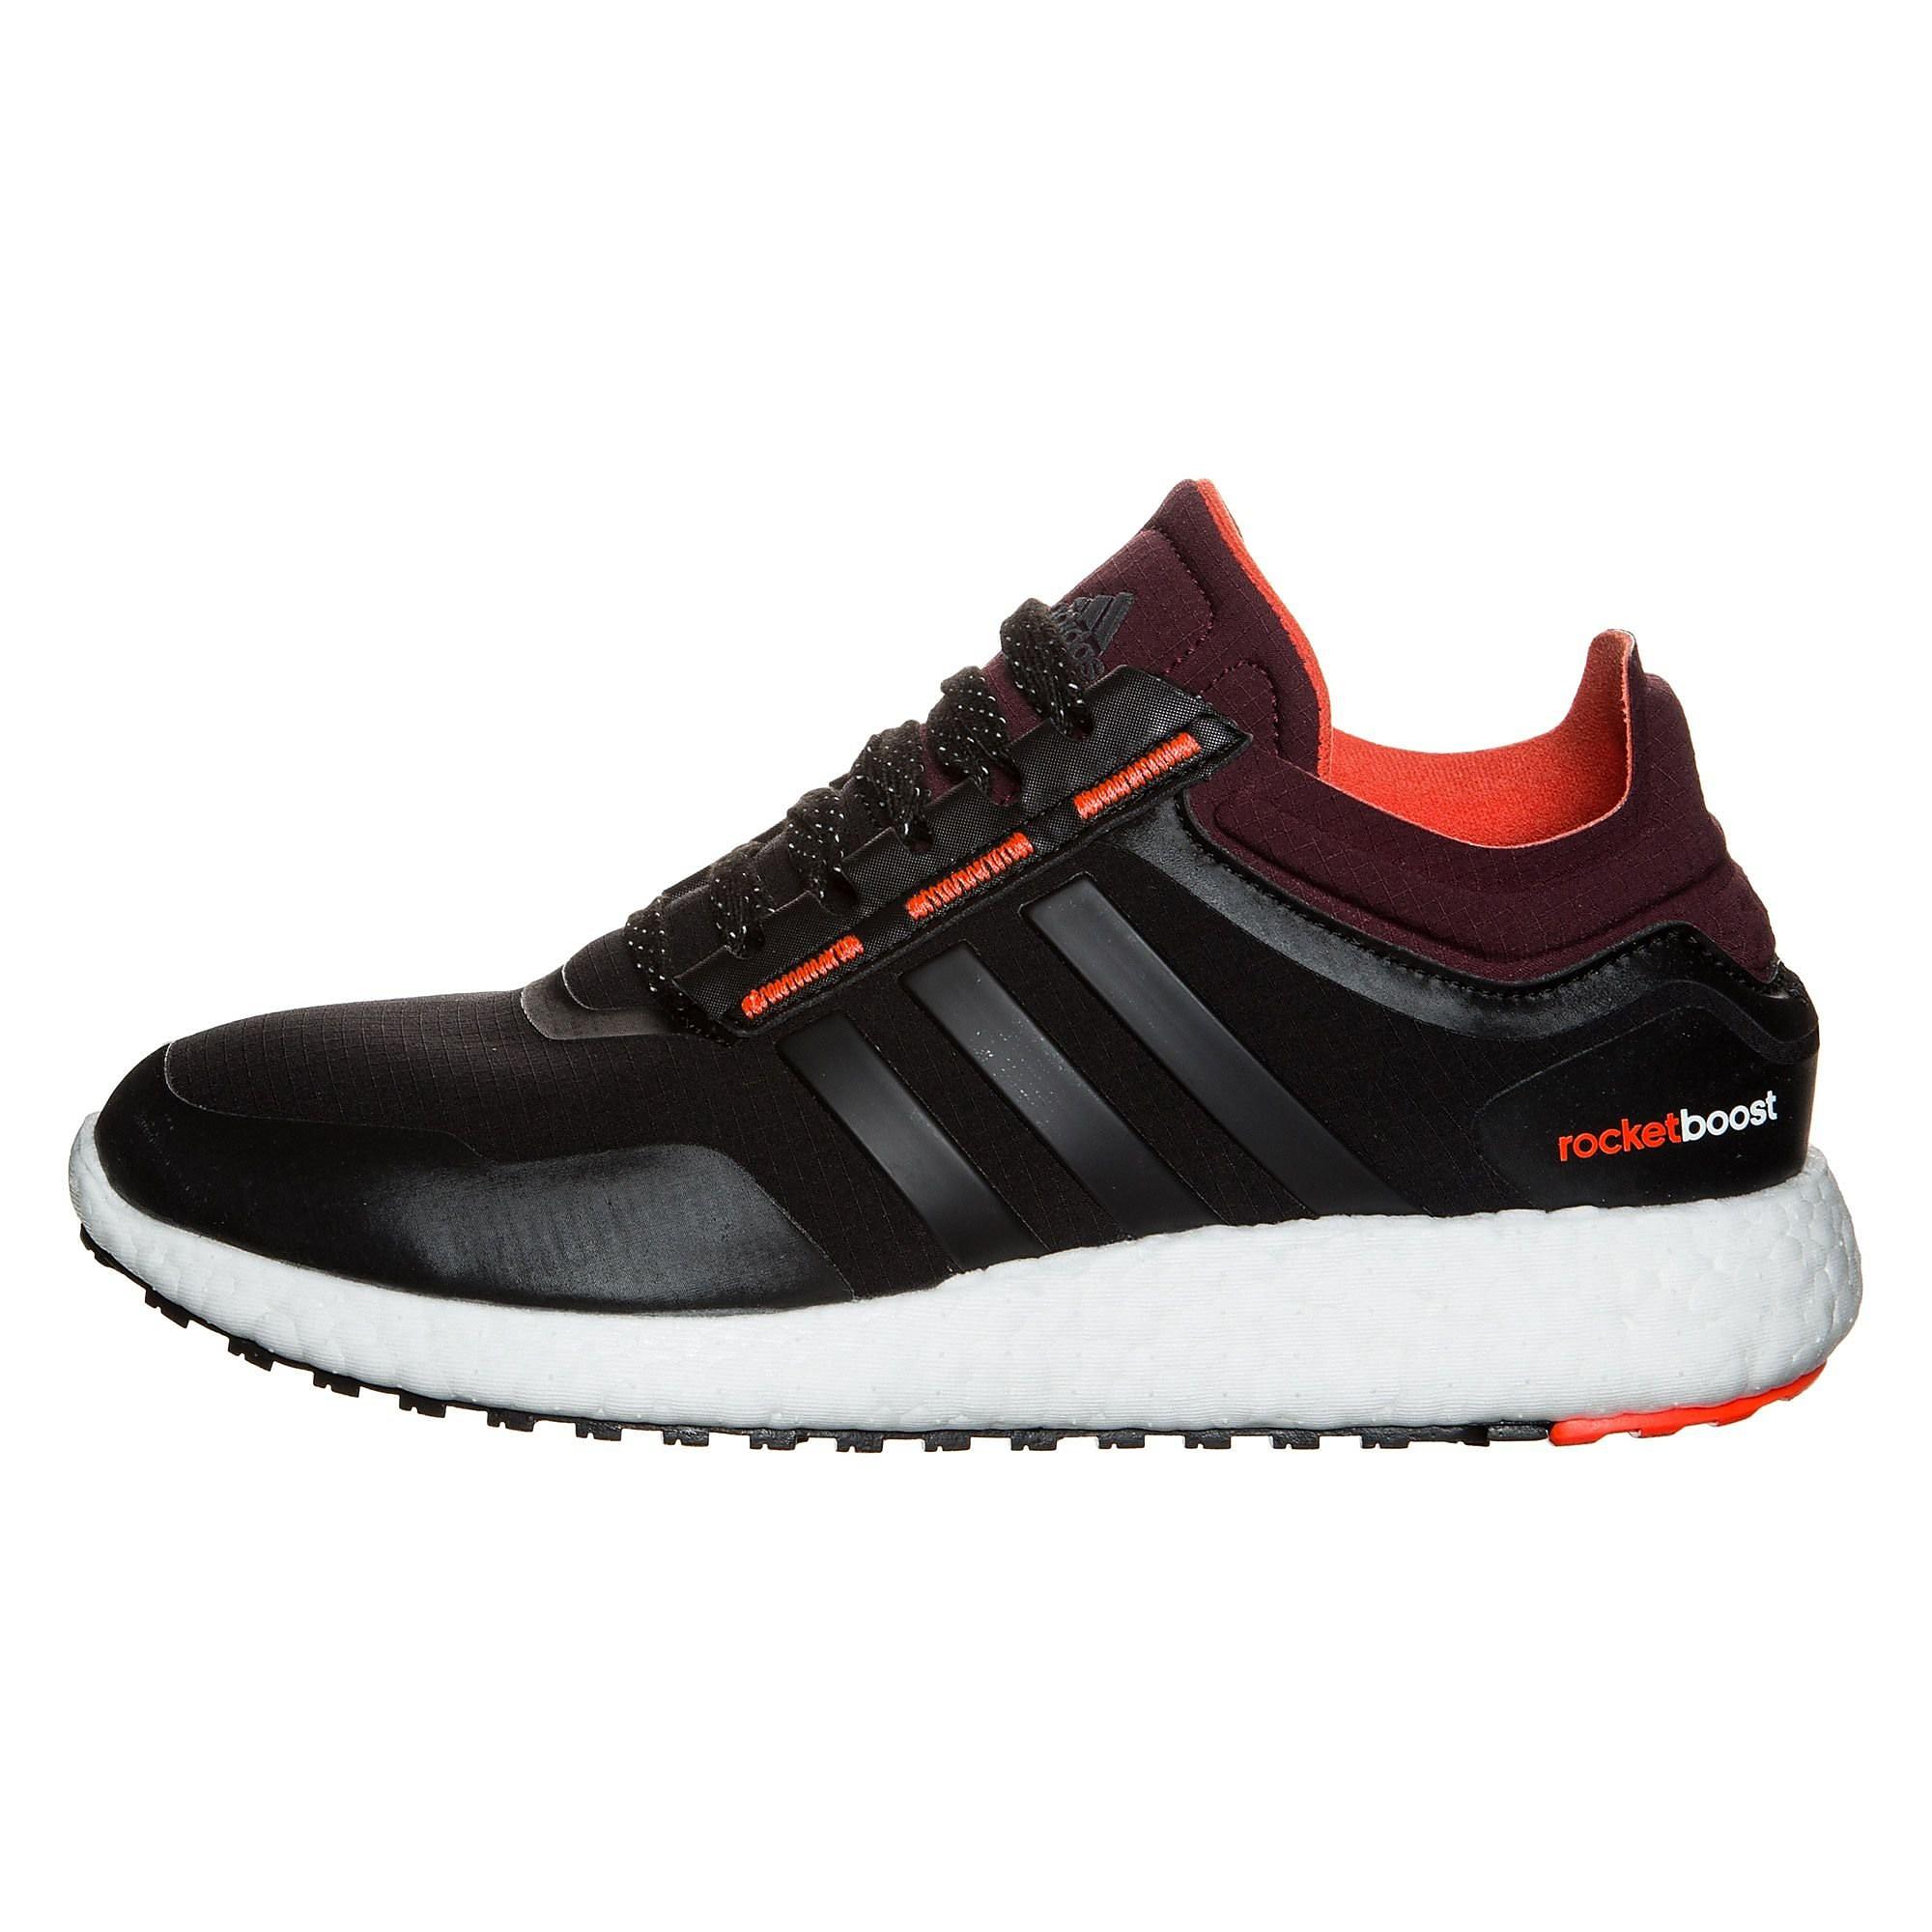 Adidas Climaheat Rocket Boost Damen Laufschuh EU 38 UK 5 bruin